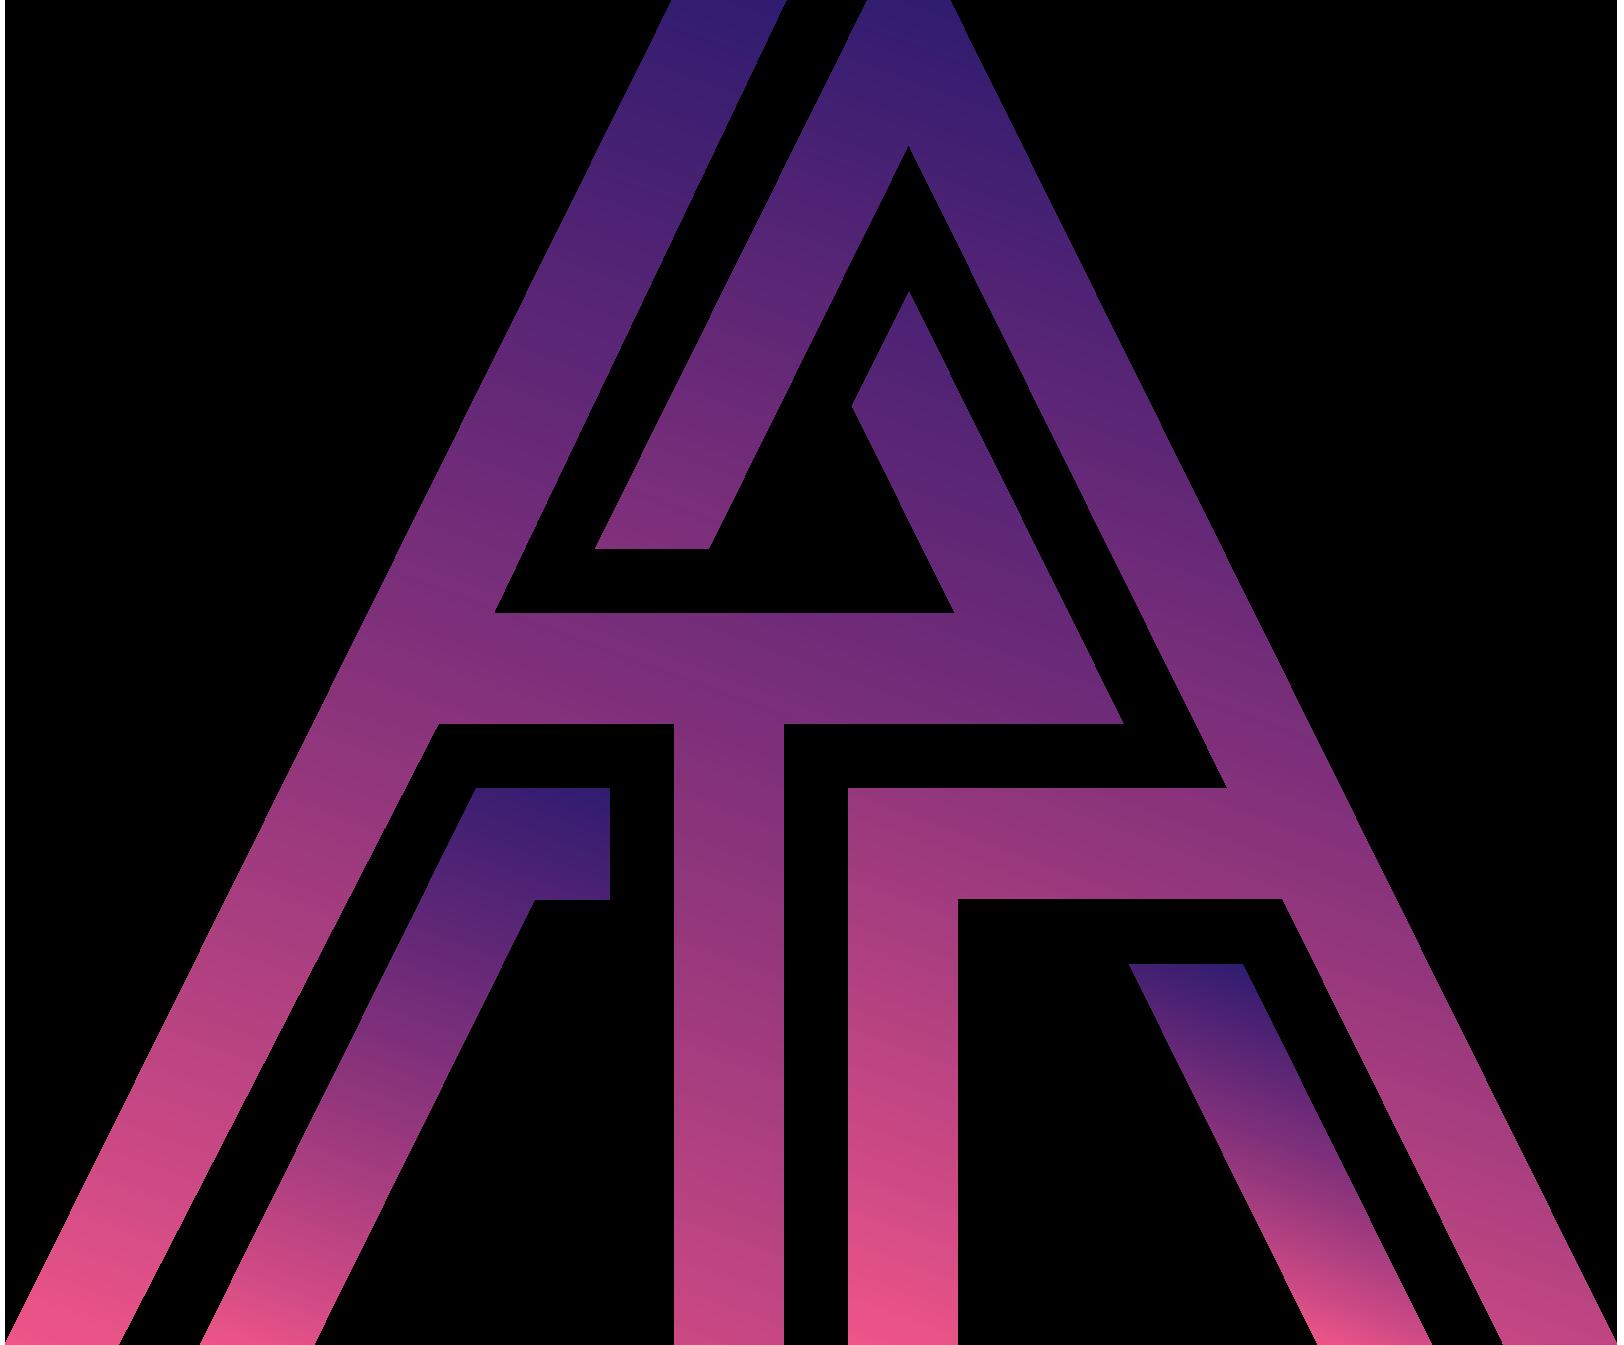 28. logo color